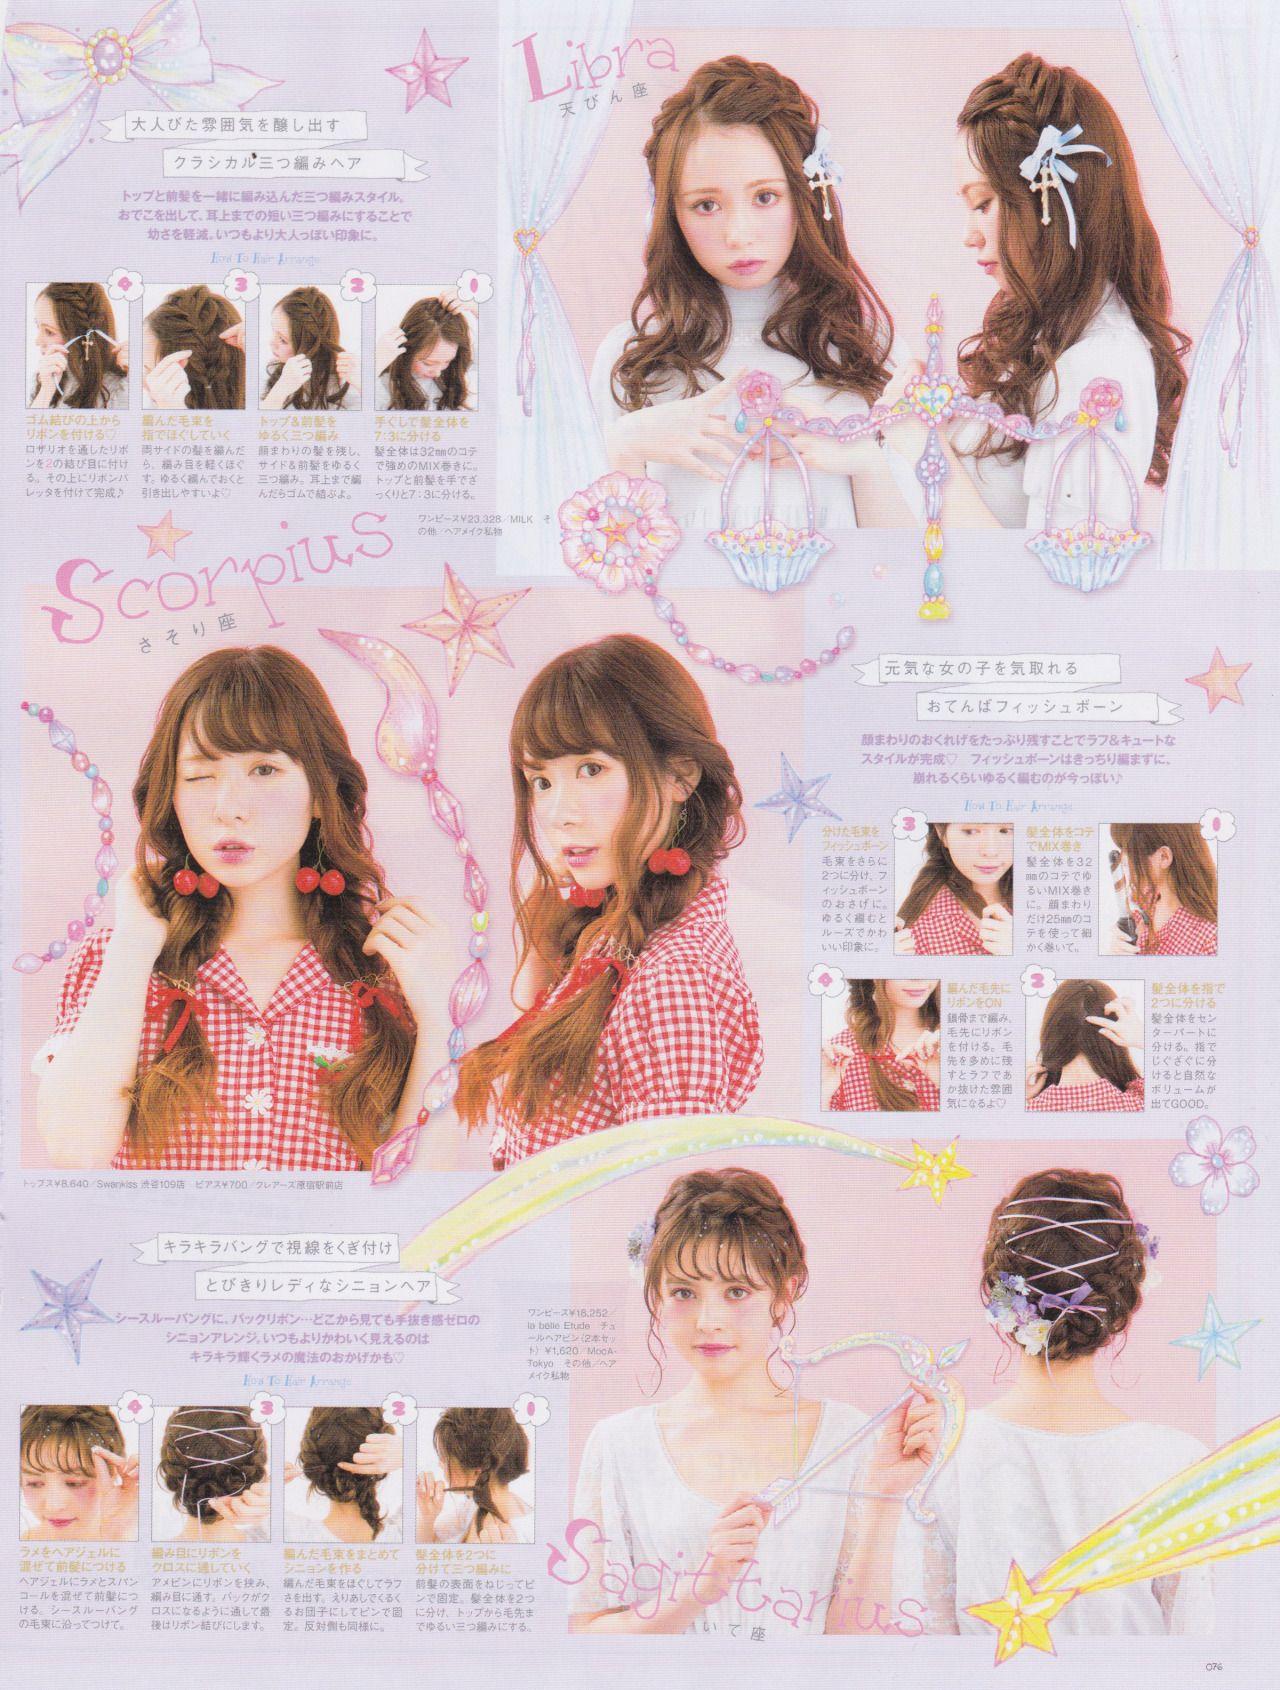 Popsister japanese fashionmakeup magazine pinterest makeup